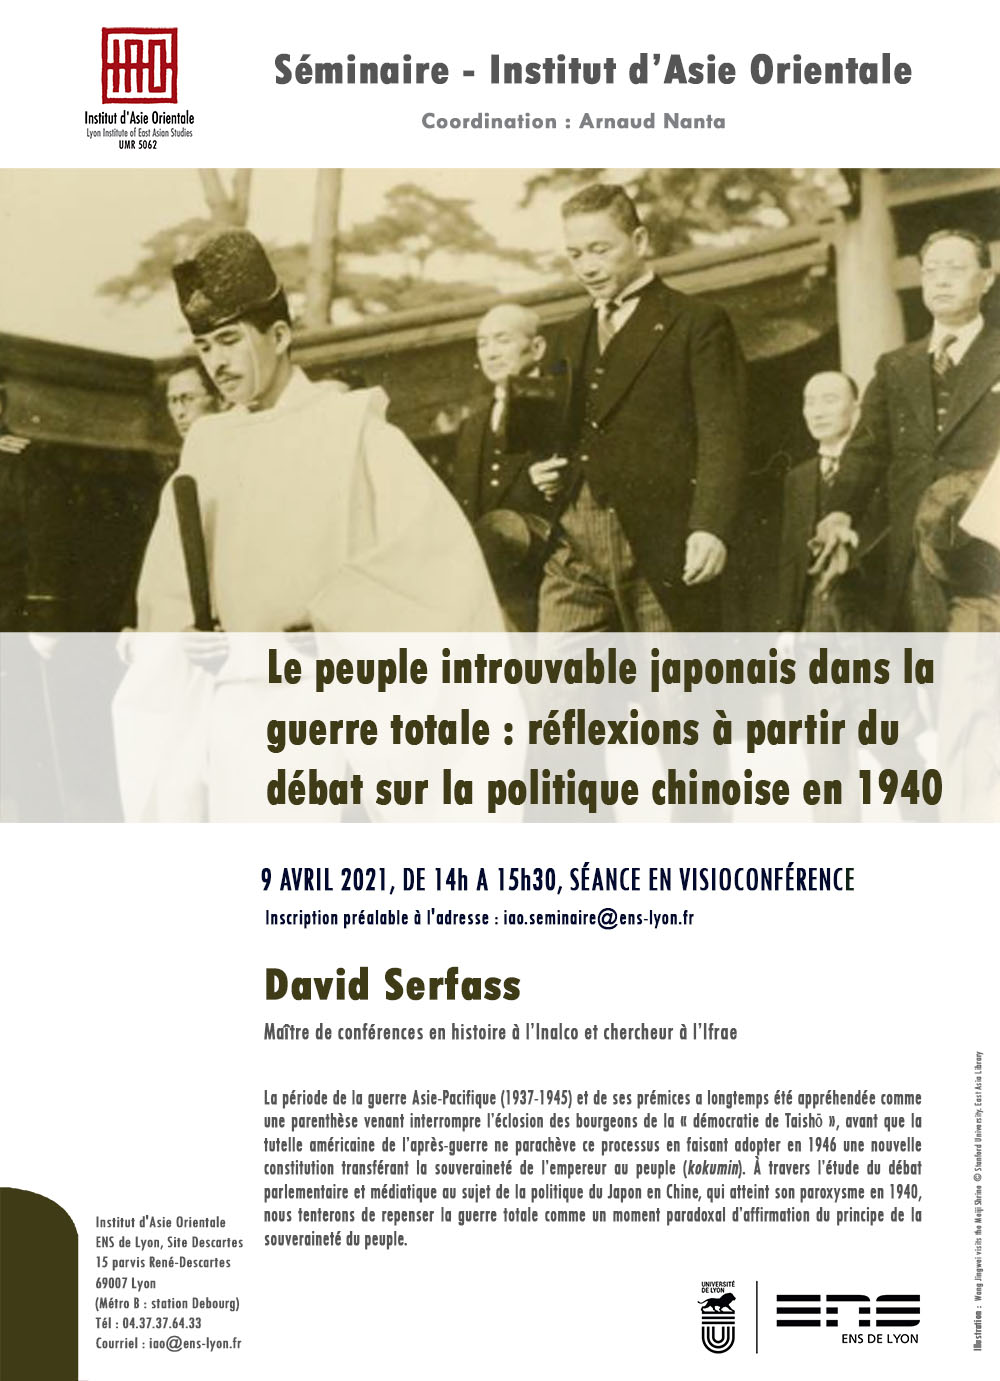 Séminaire de l'IAO : David Serfass